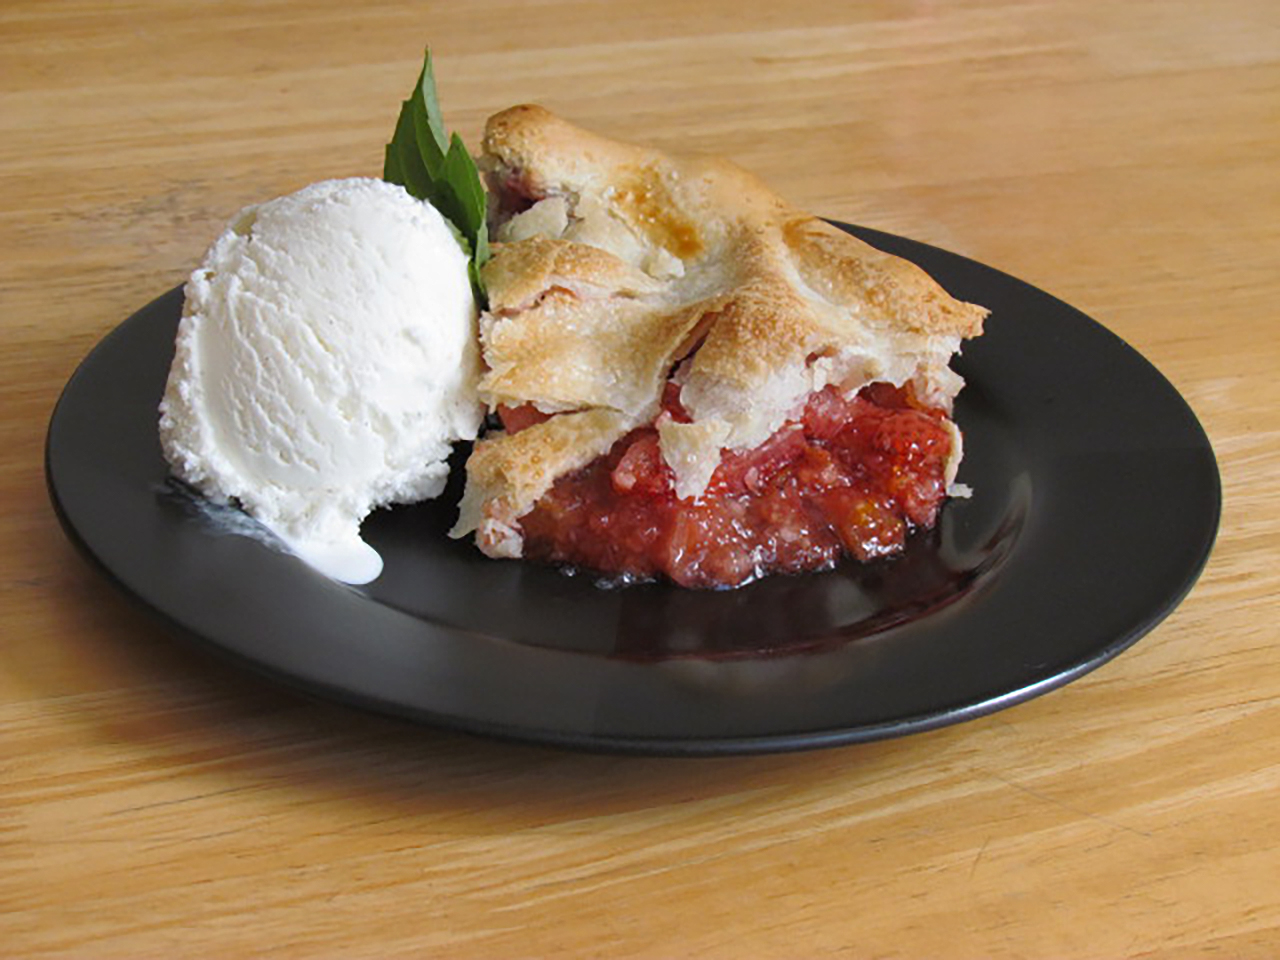 Orange-Kissed Strawberry Rhubarb Pie whodunitrdr